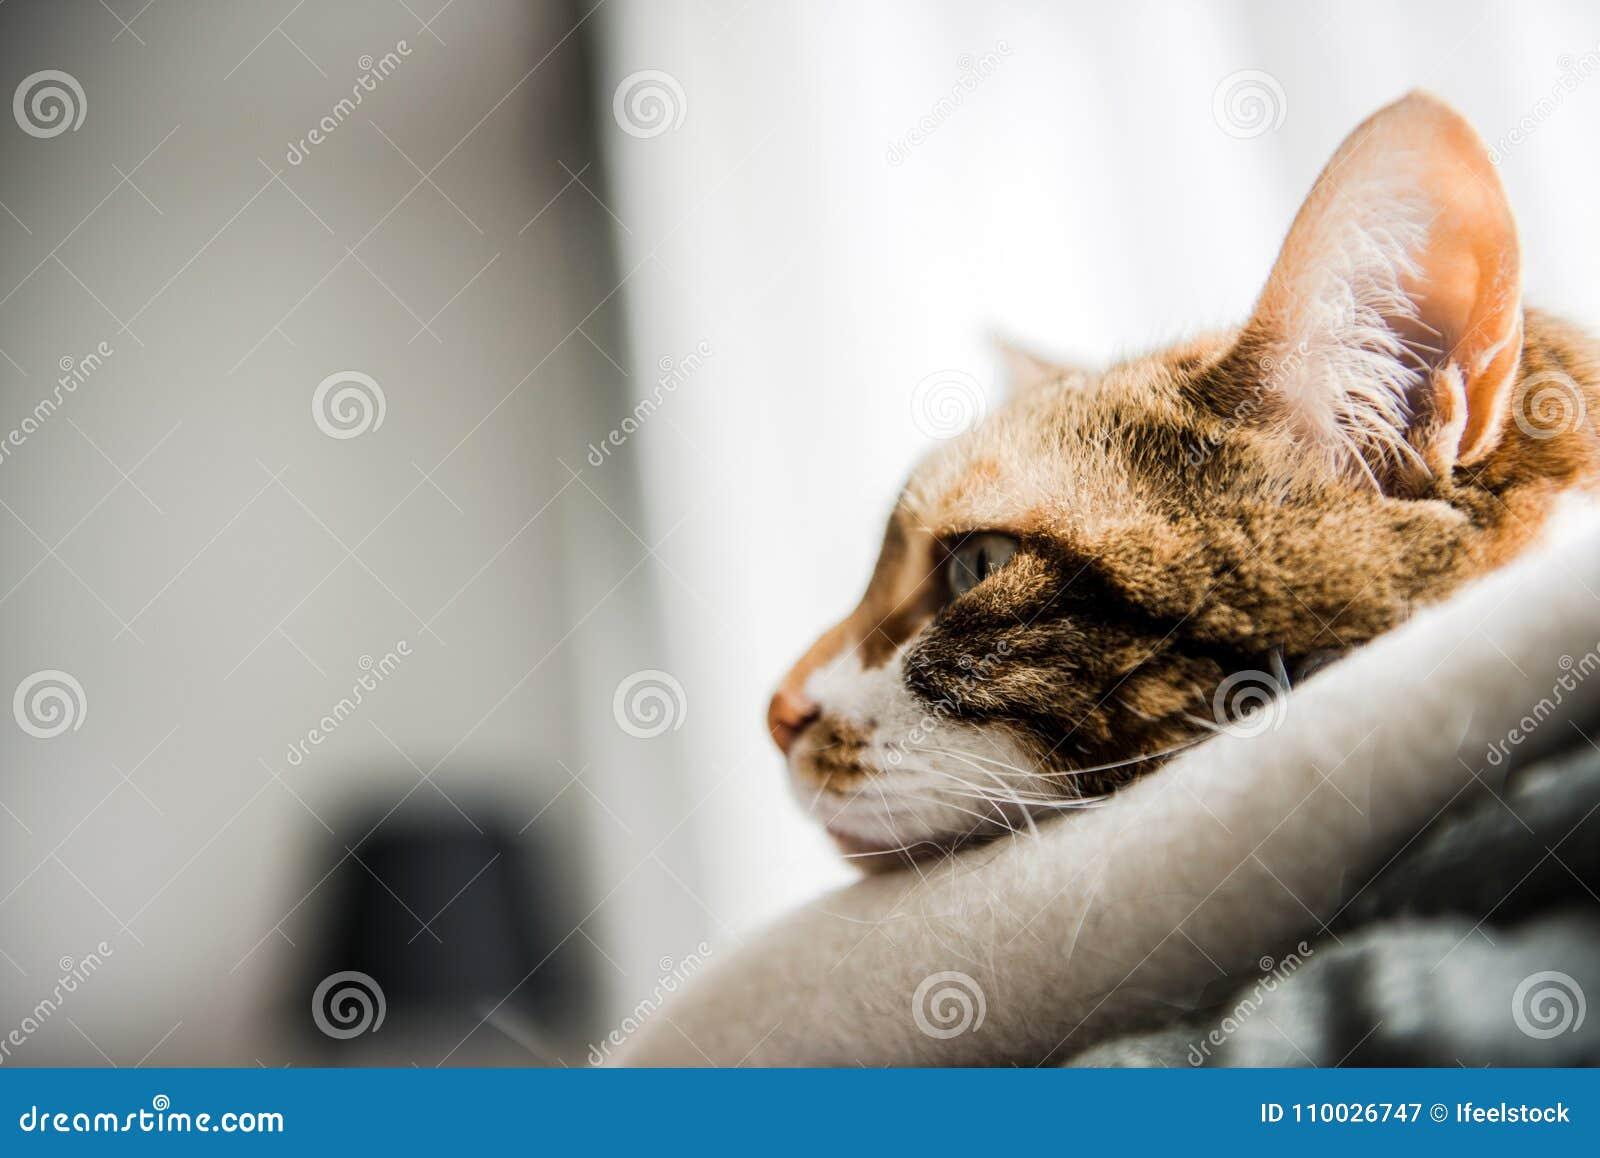 Profielmening van leuke kat met grappig gezicht